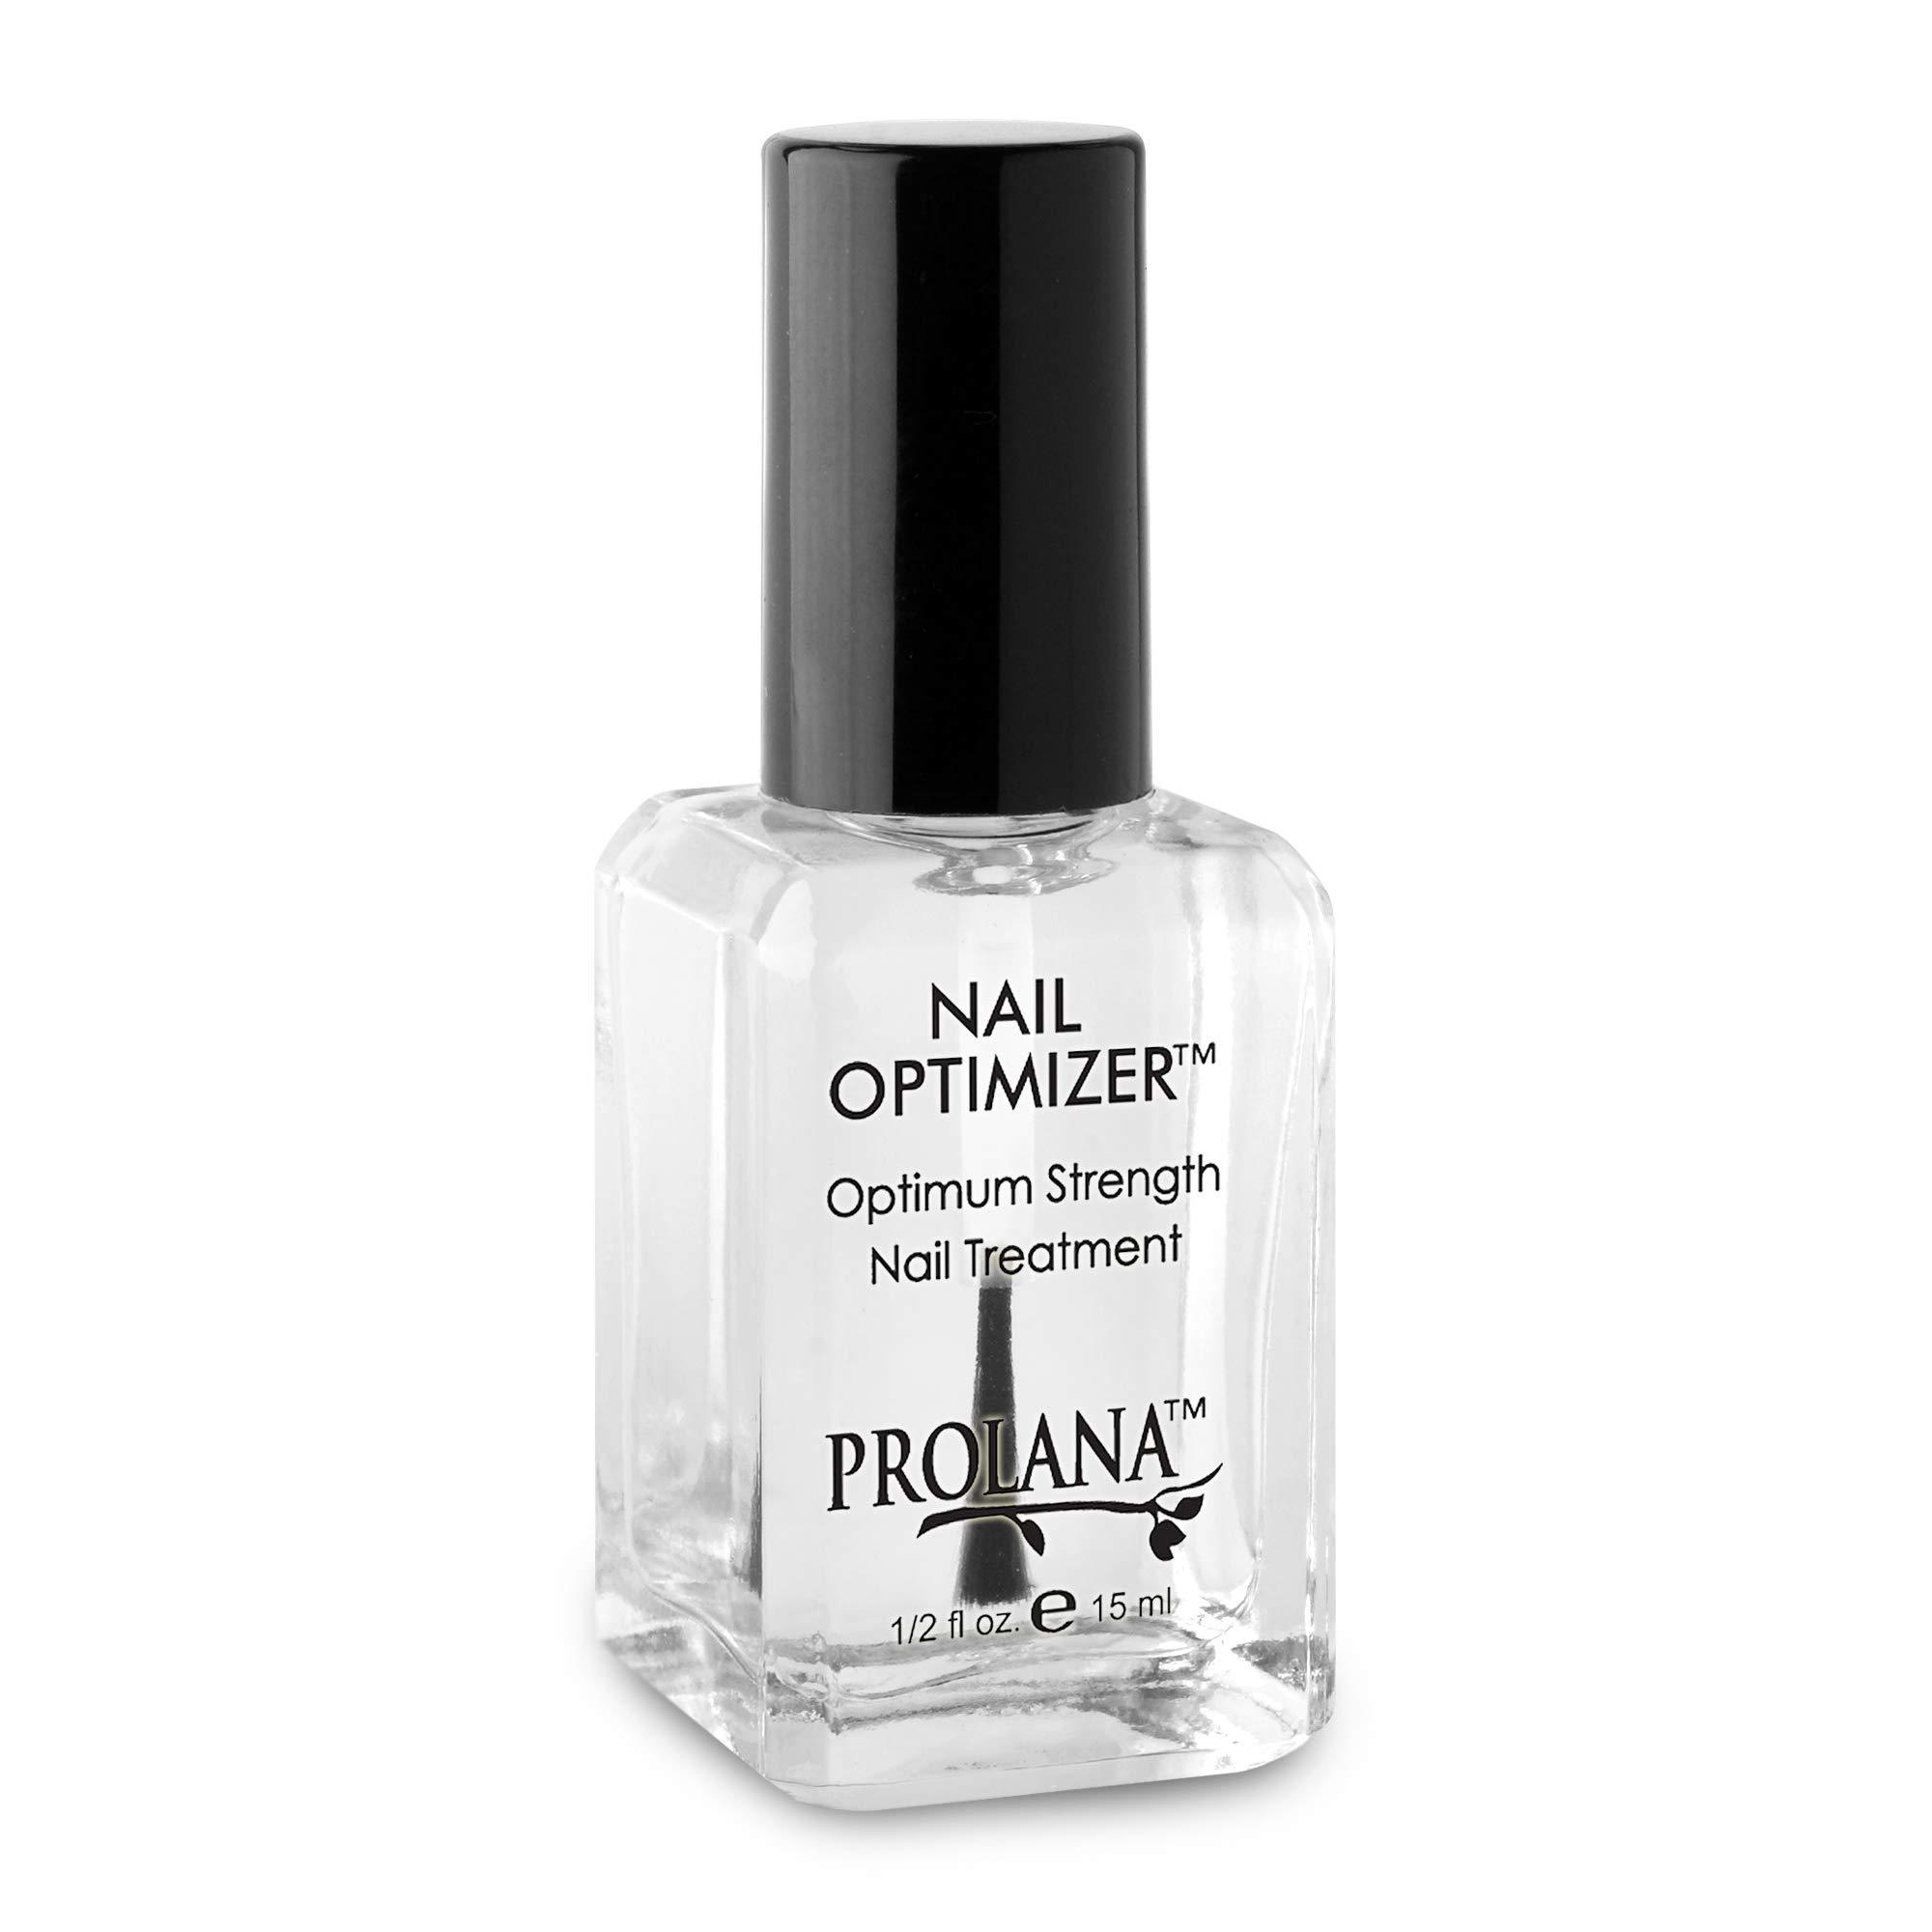 Prolana Nail Optimizer One-Step Multi Use Nail Fortifier, Nail Hardener, Nail Strengthener - Optium Strength Nail Treatment .5 ounces/ 15 milliliters by Prolana